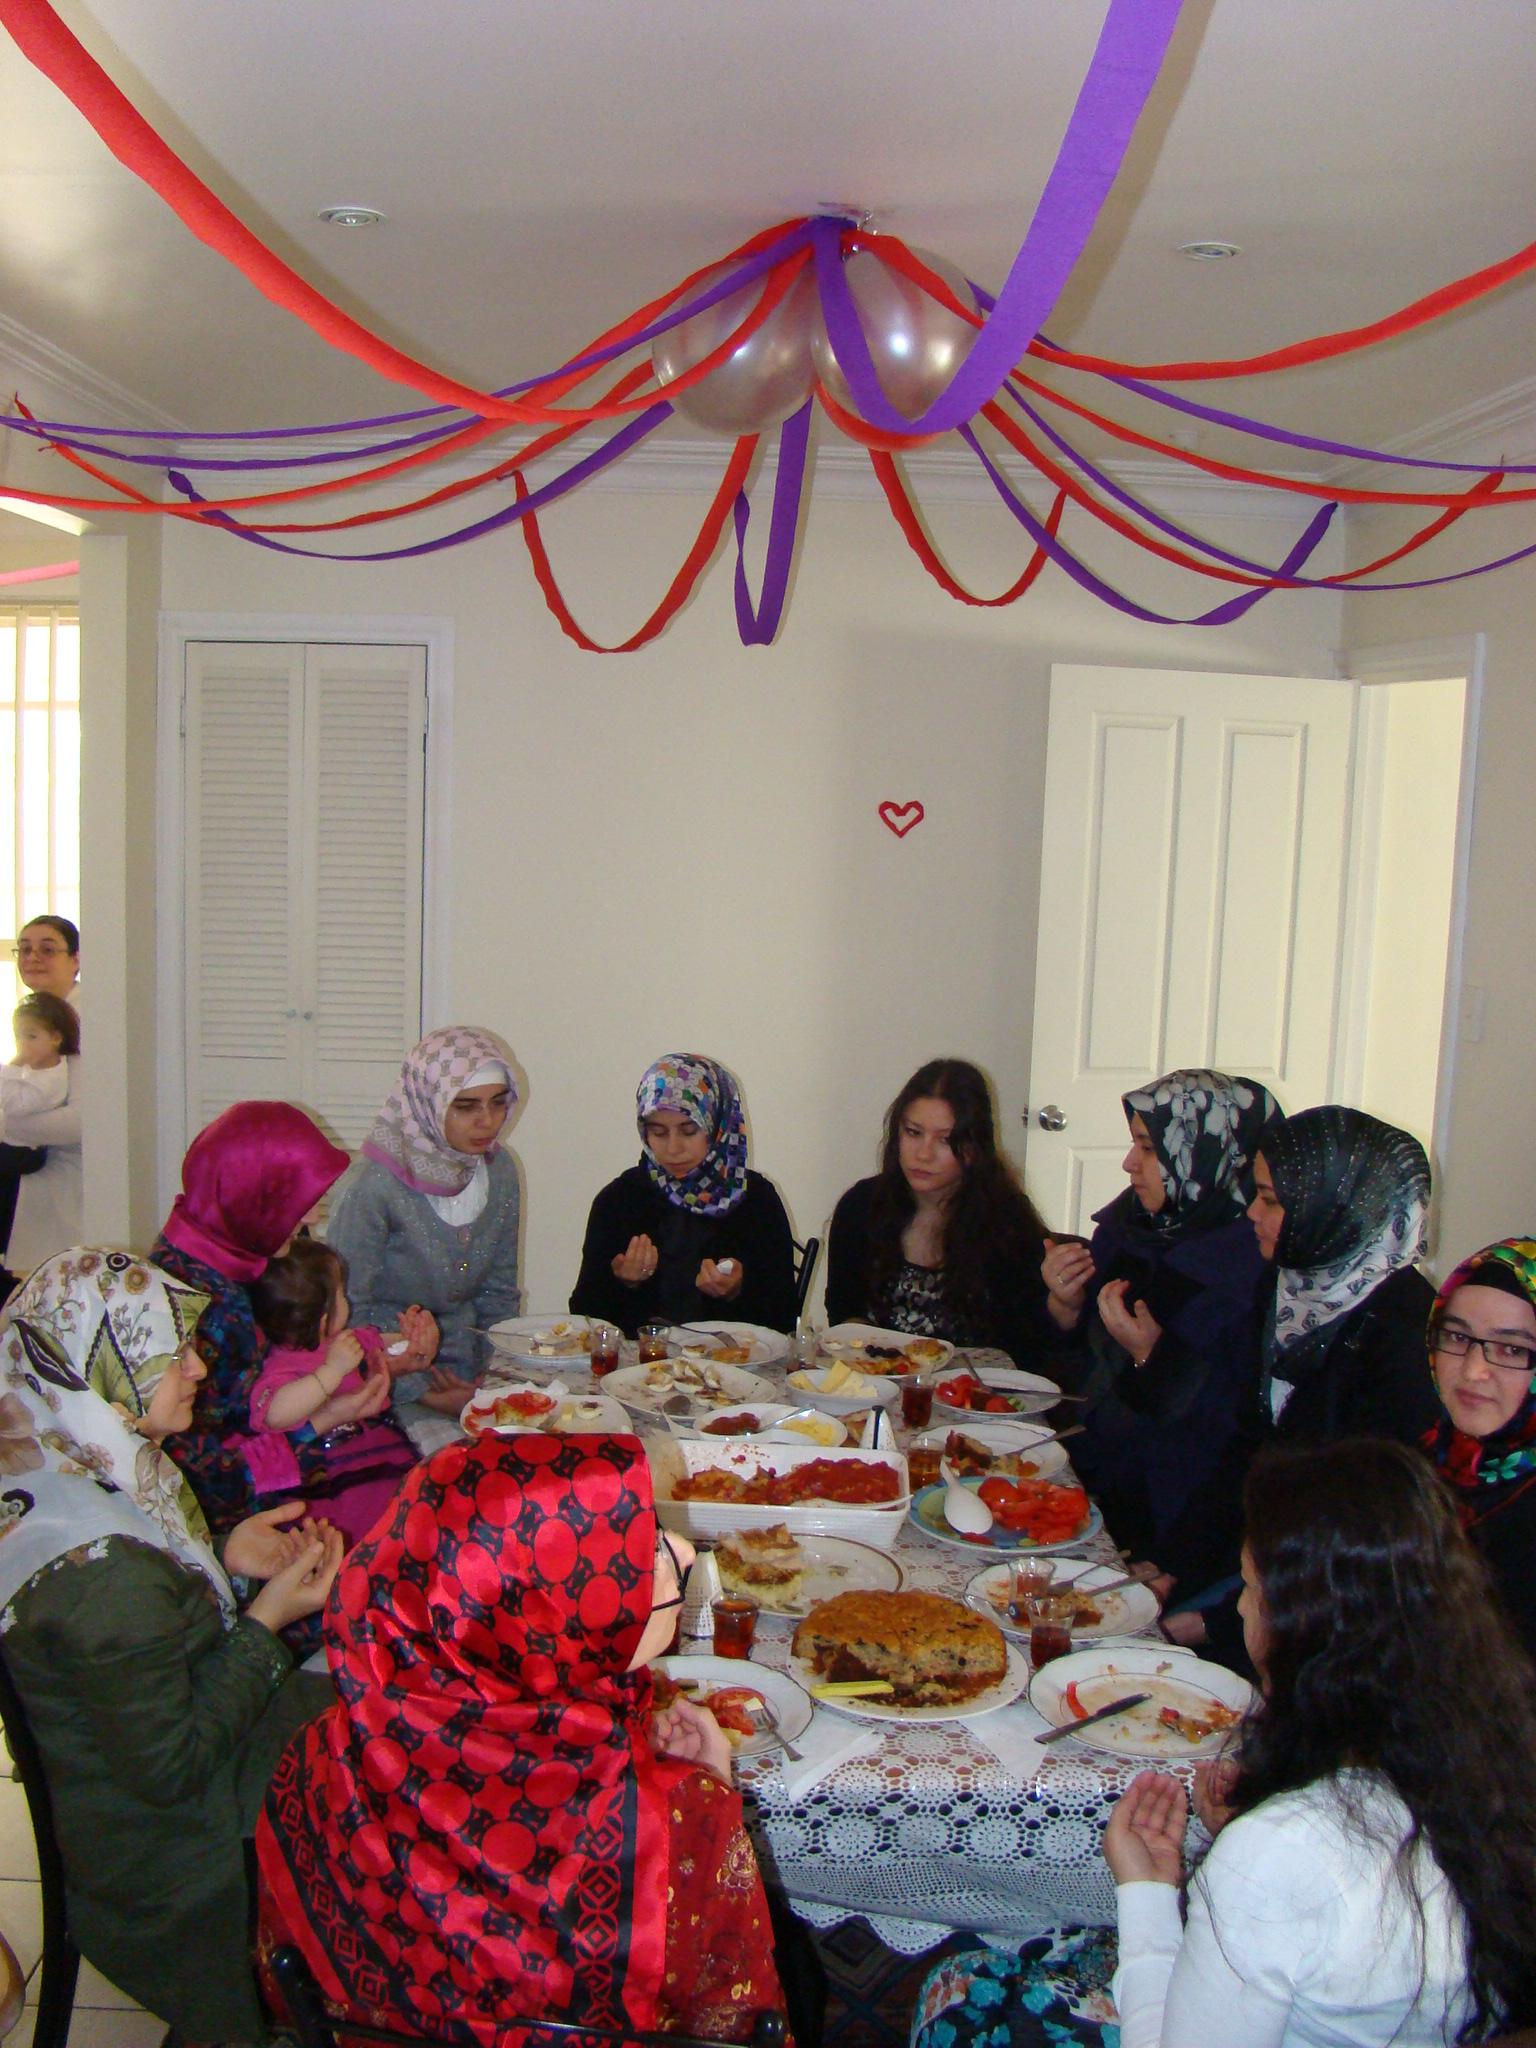 ramadan - researcher's photo.JPG